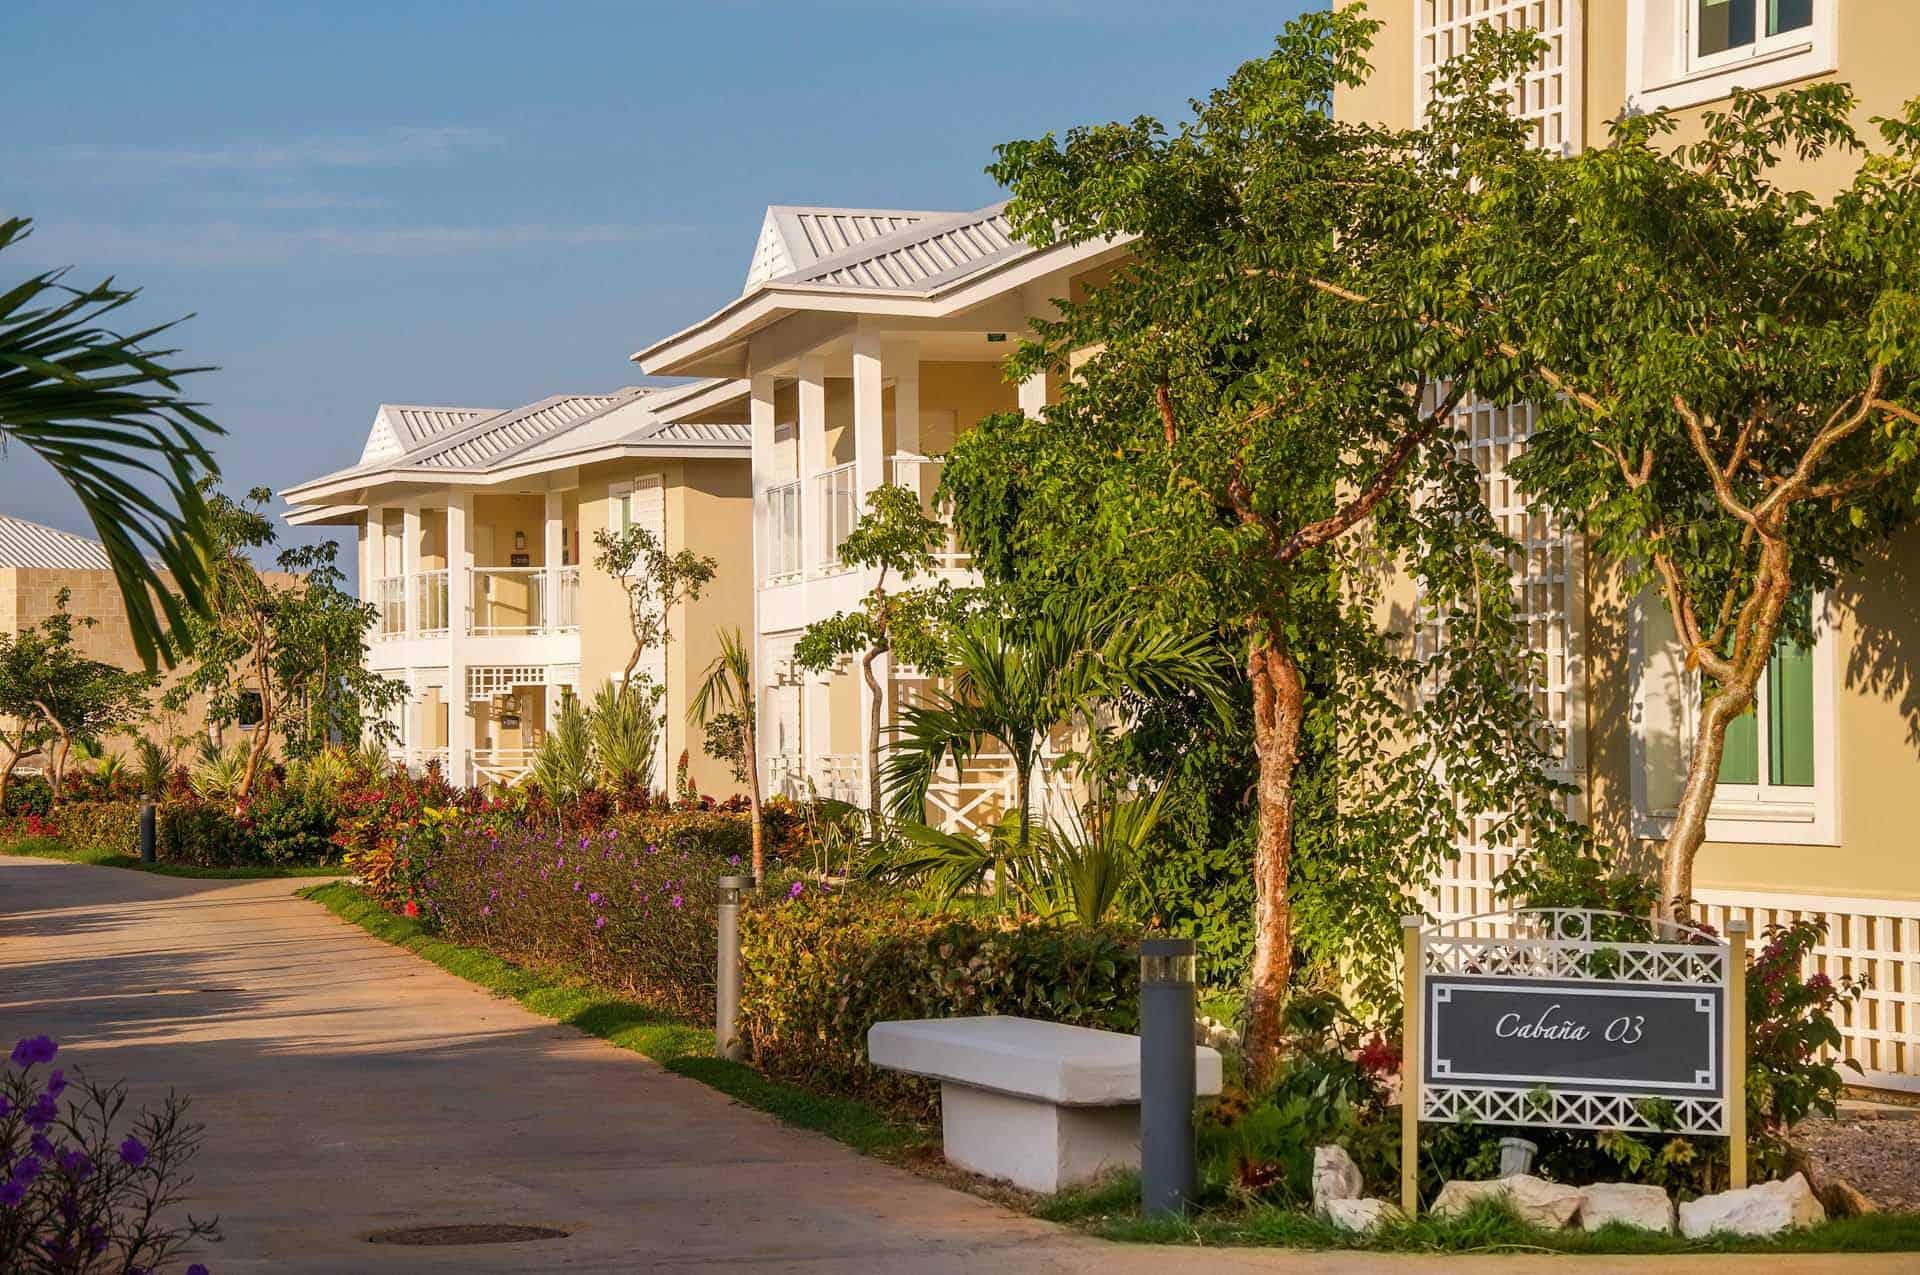 H4823 H4826 Hotel Angsana 03 cuba autrement